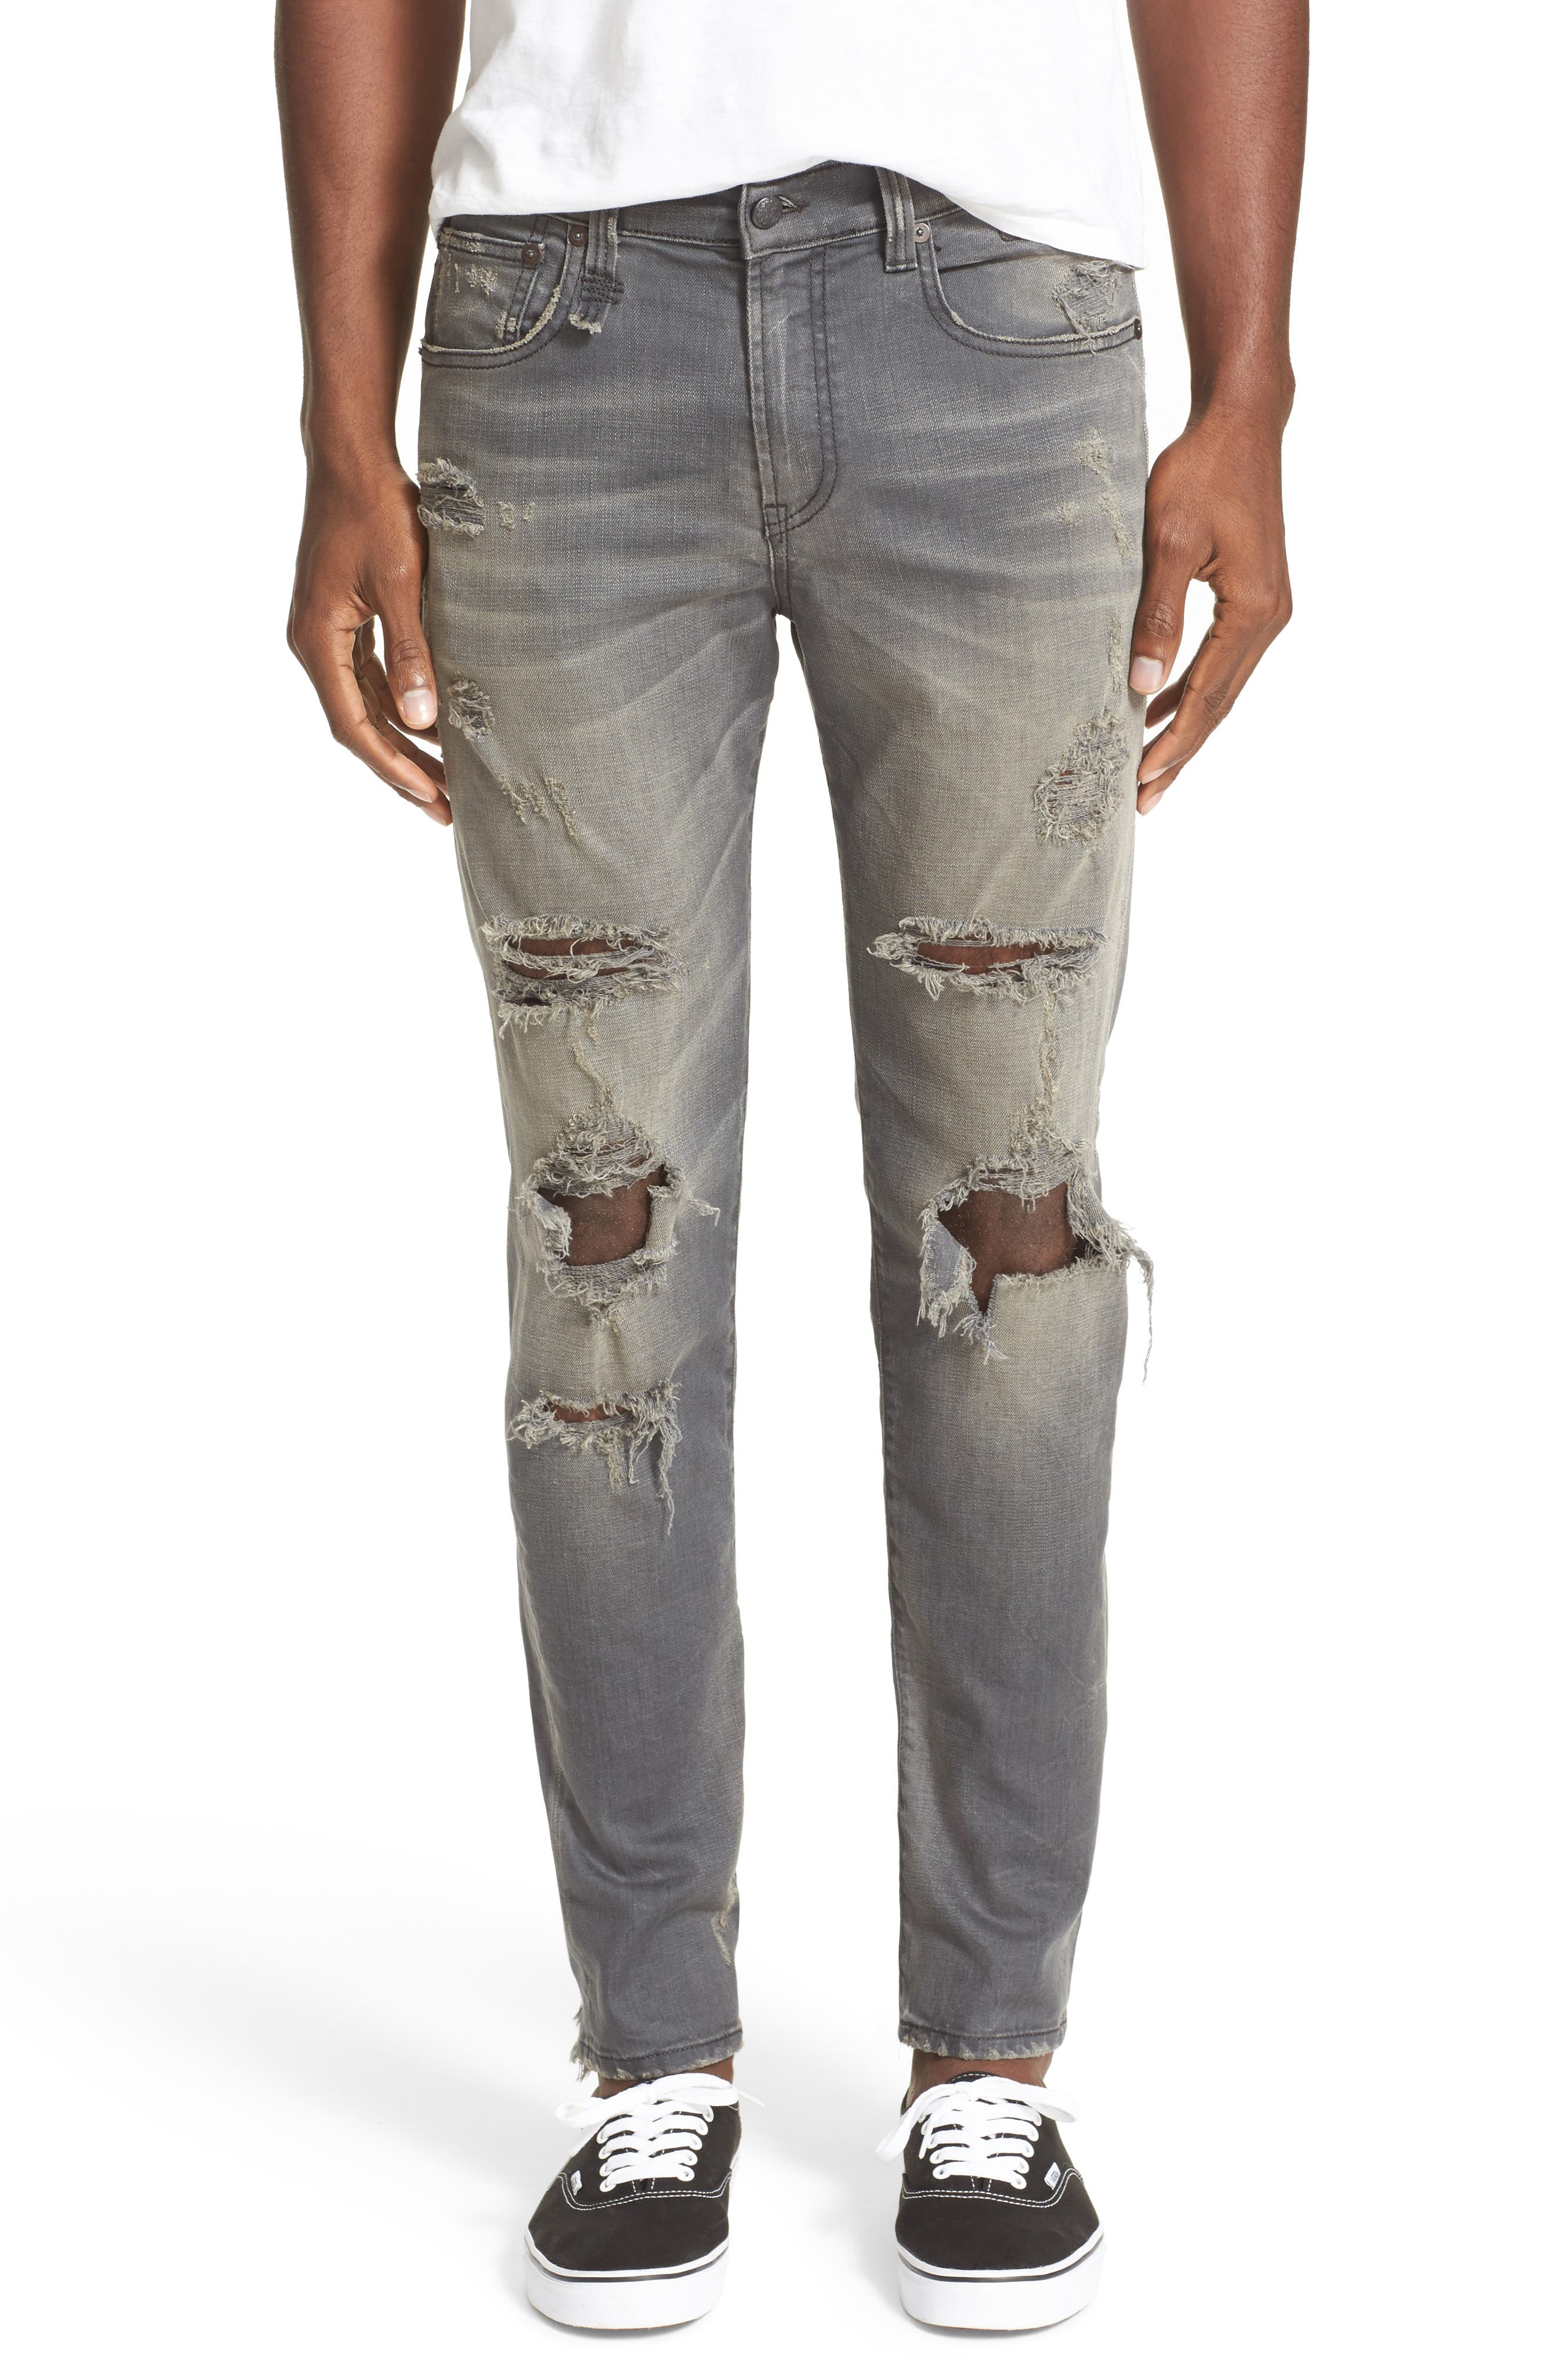 Skate Shredded Skinny Jeans,                         Main,                         color, 020